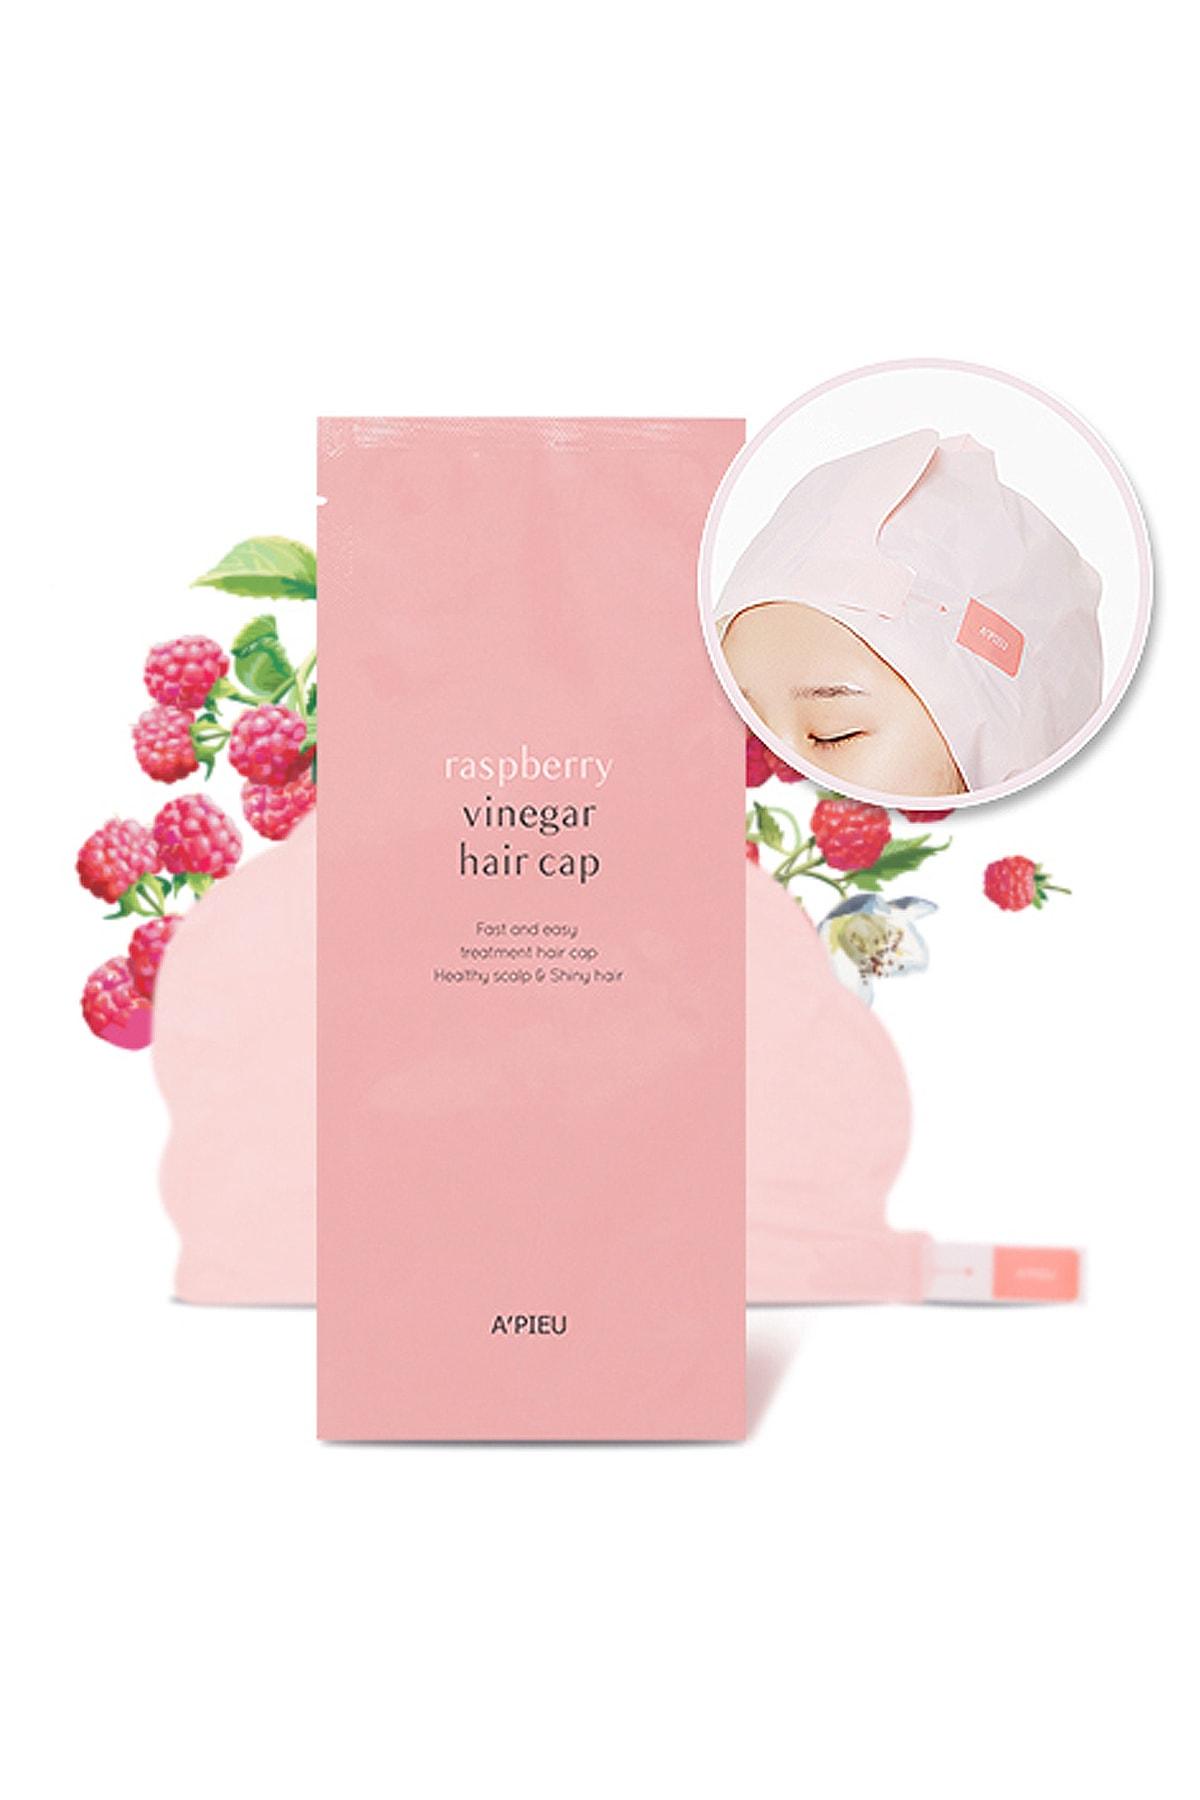 Missha Saçlara Parlaklık Veren Ahududu Saç Maskesi 35g APIEU Raspberry Vinegar Hair Cap